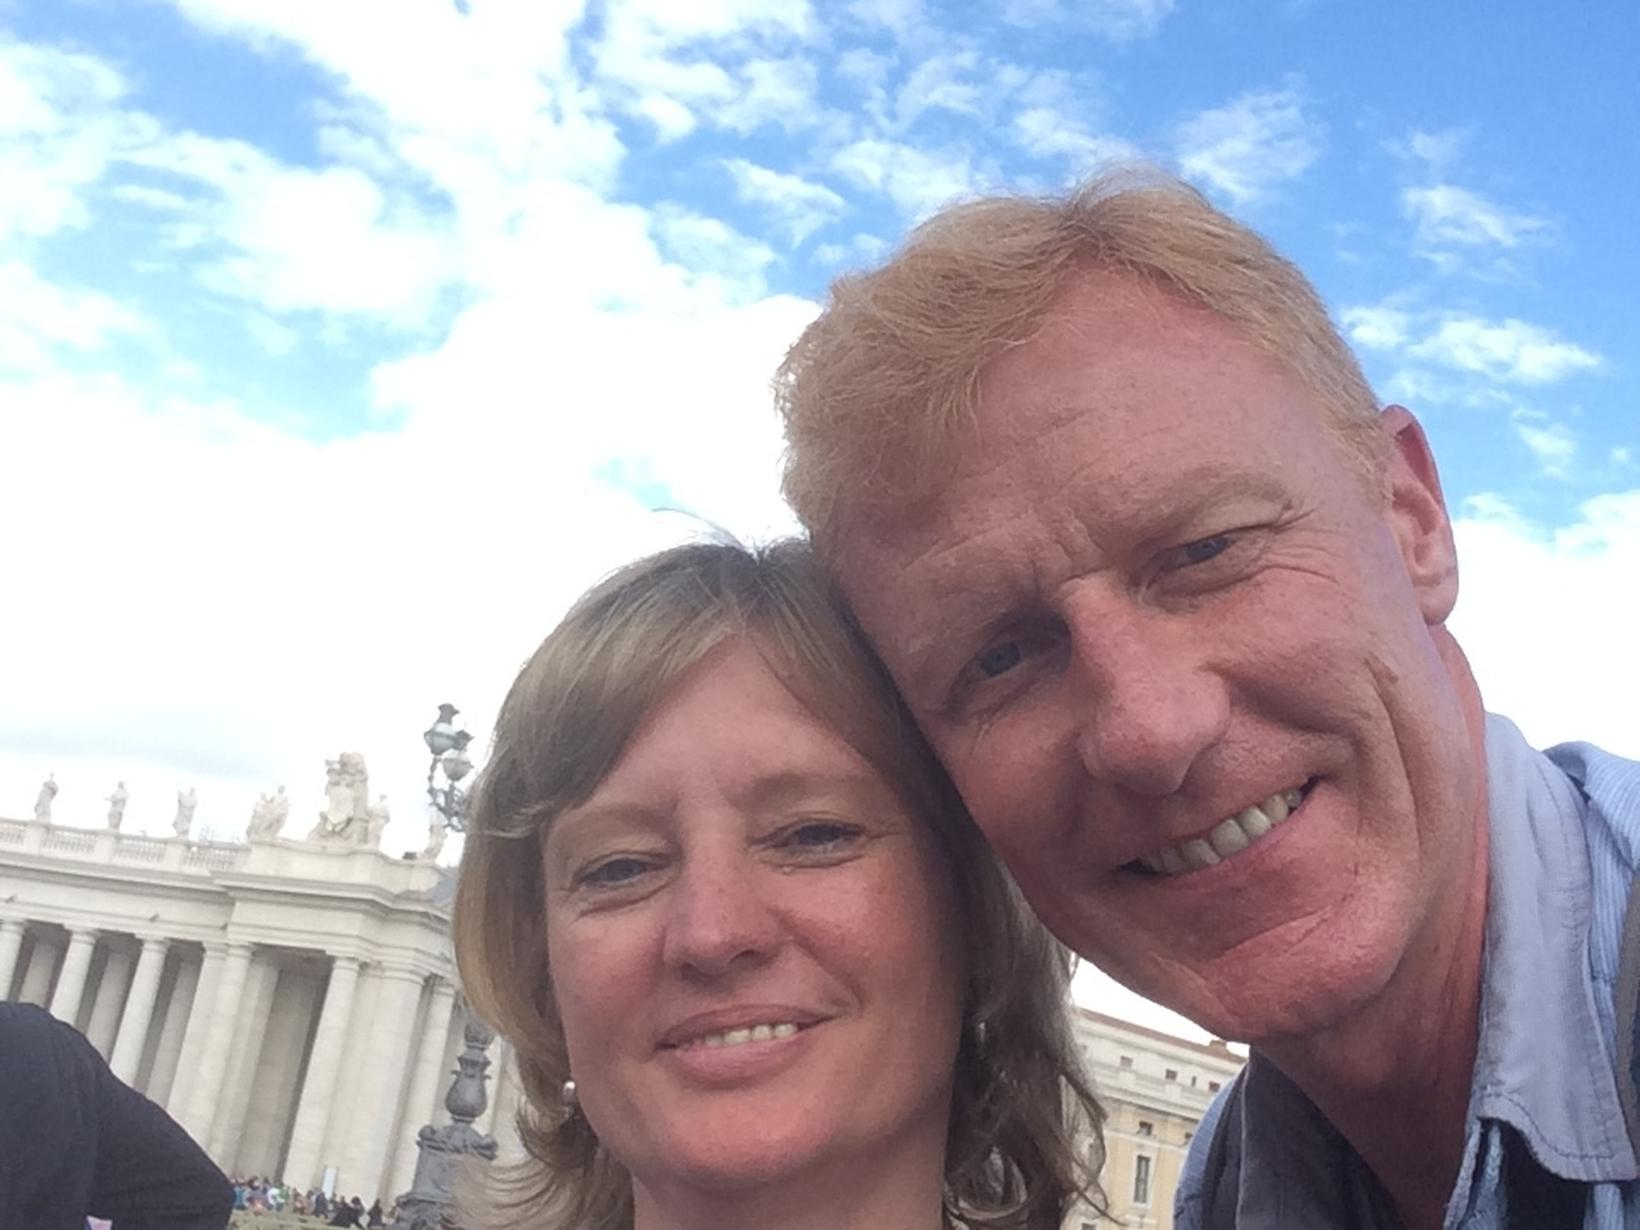 Bernd & Silvia from Idar-Oberstein, Germany